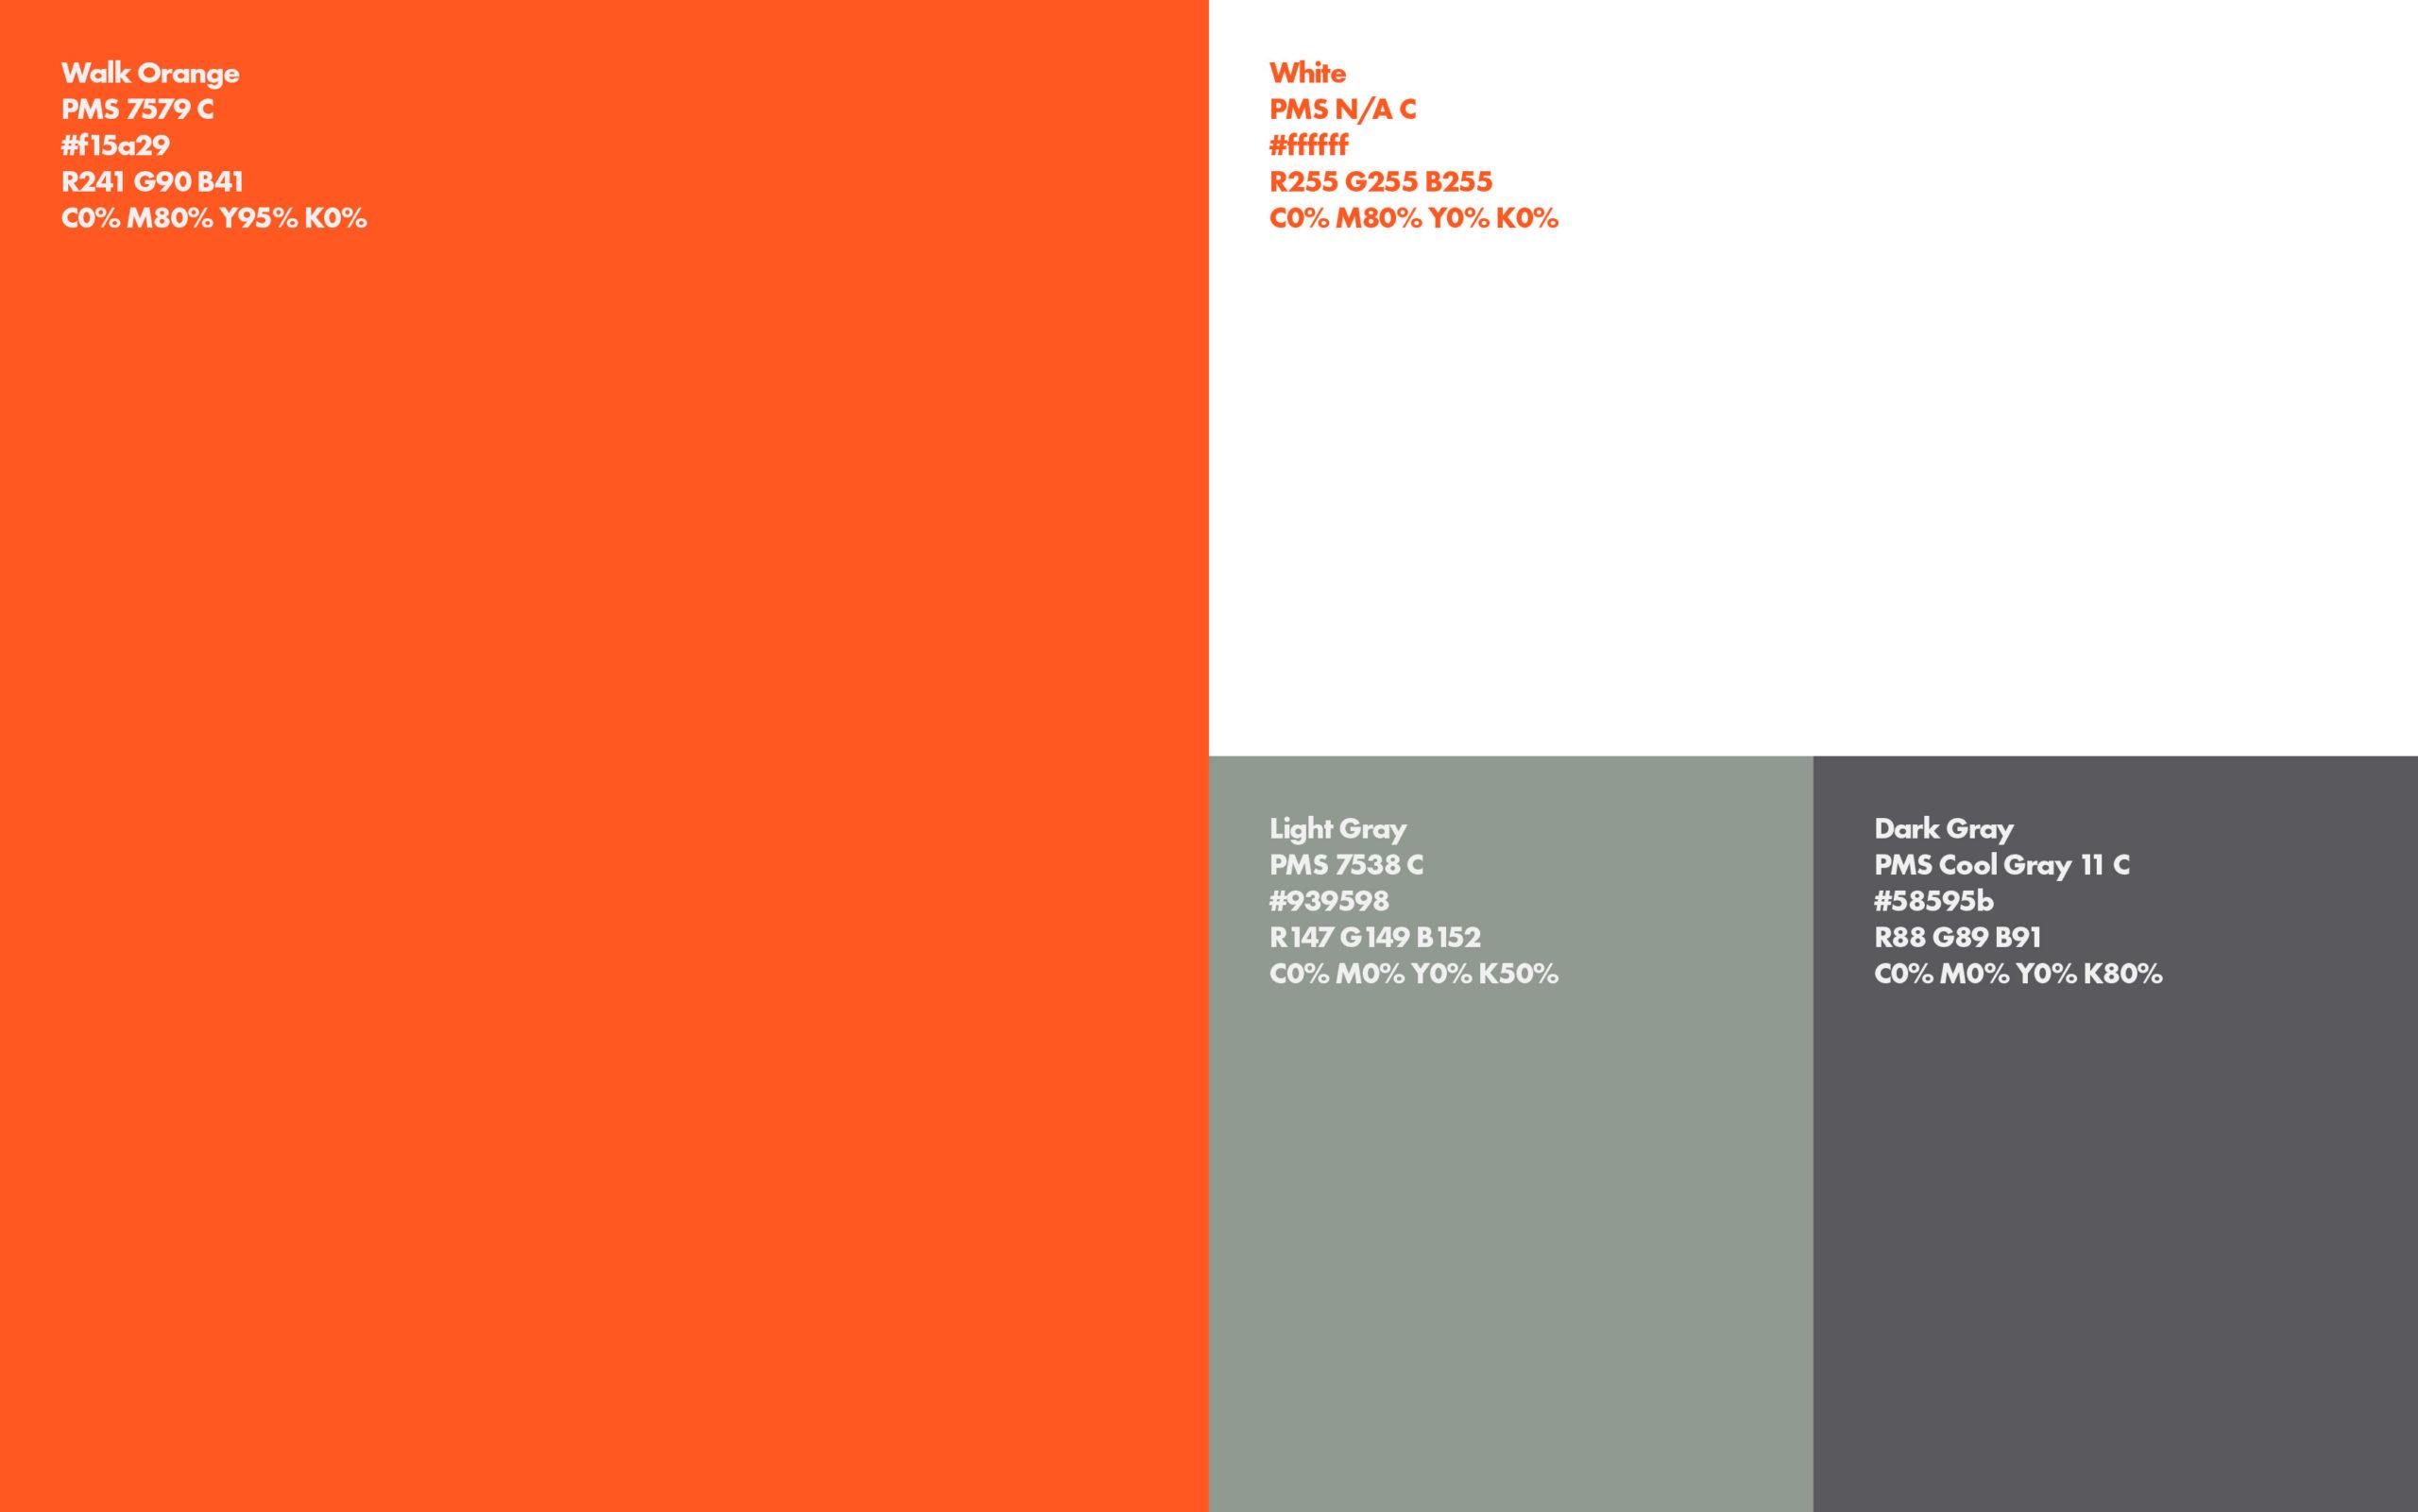 Walk-Missions-Brand-Identity-Design_5